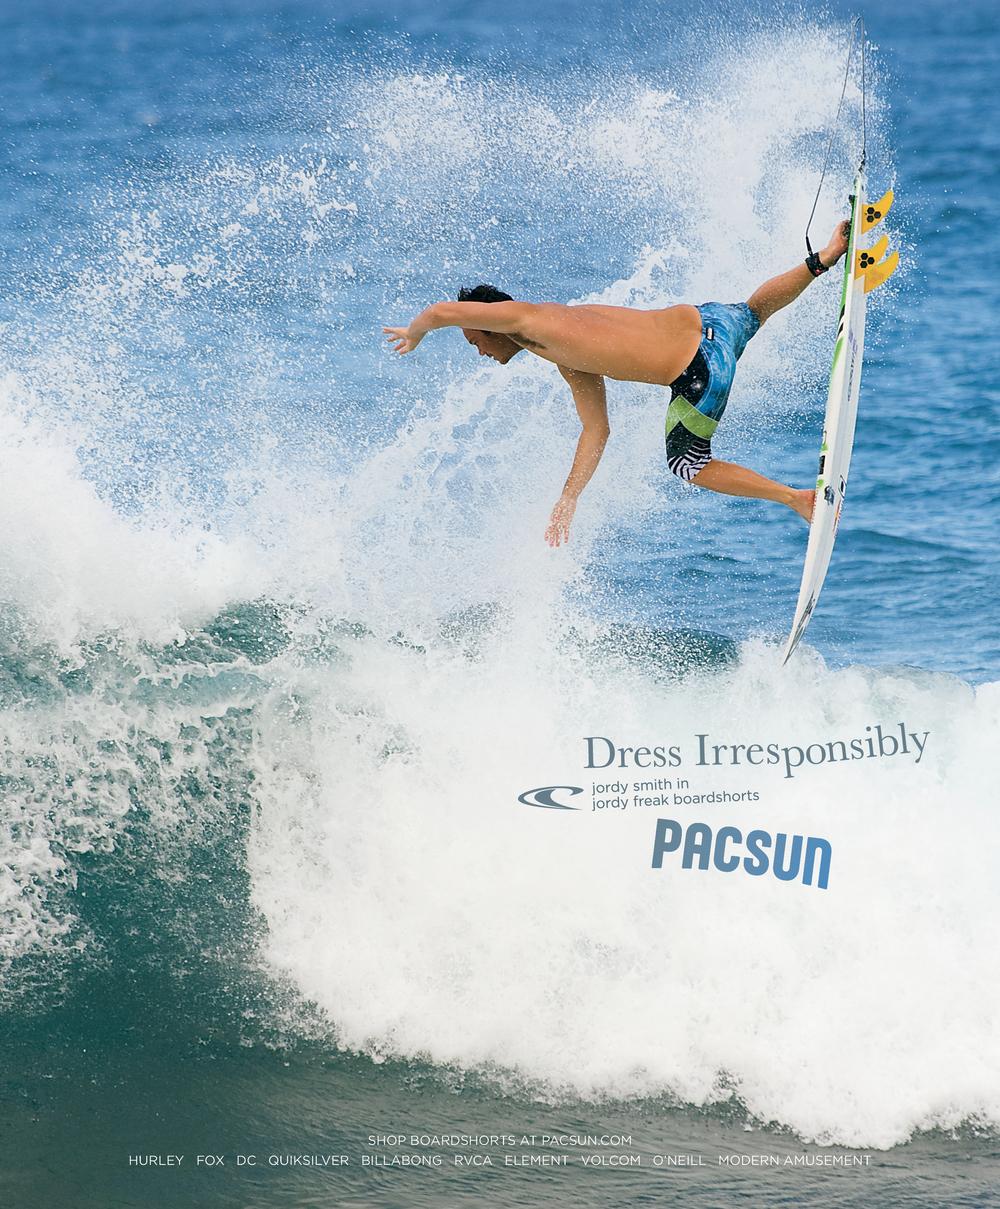 984_PacSun_Jordy_TW_SURF_050511_lo.jpg